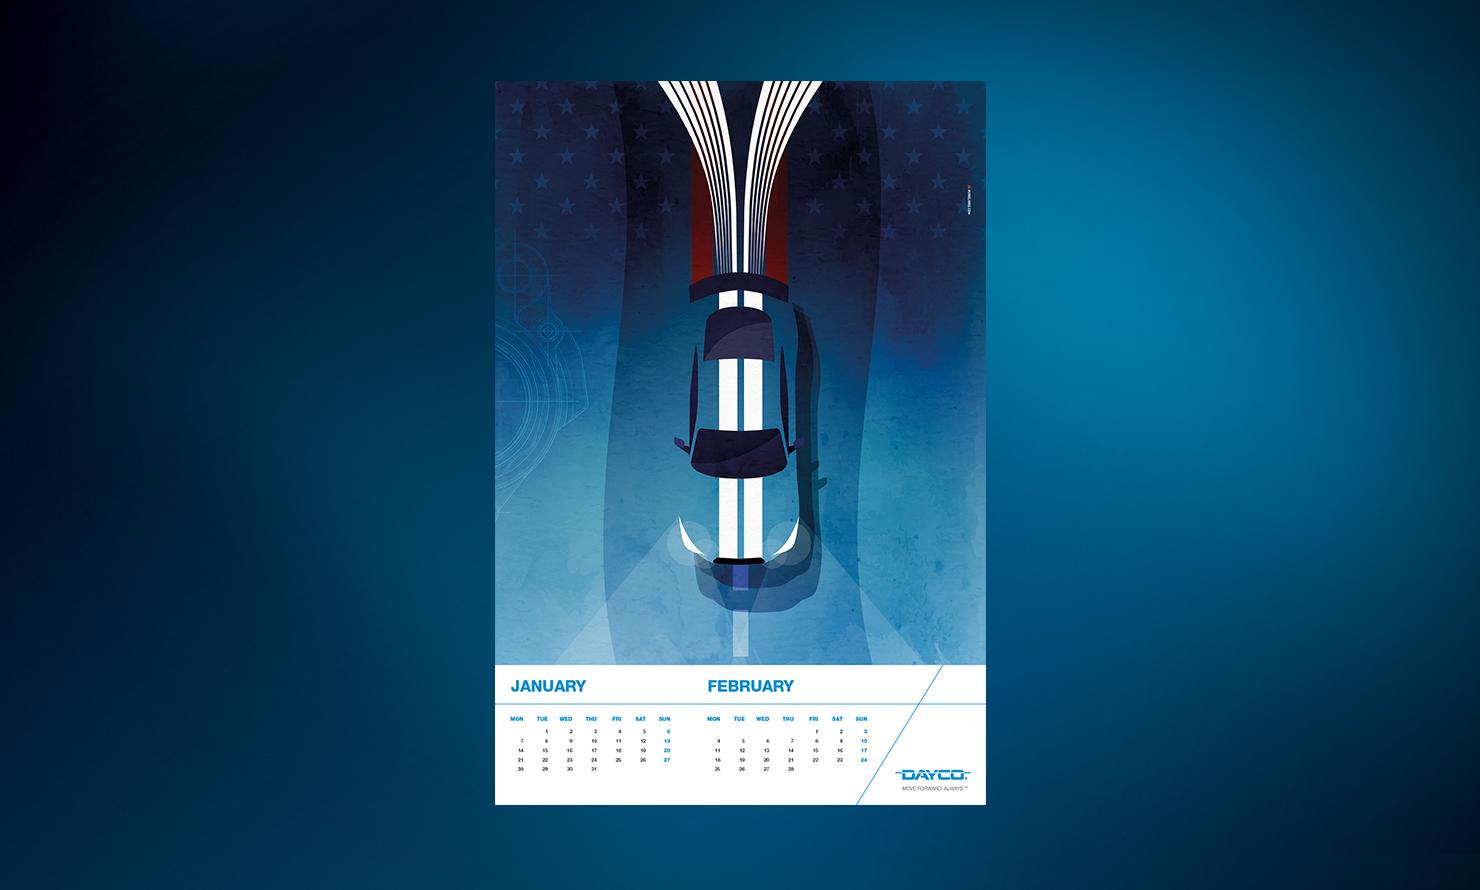 https://www.kubelibre.com/uploads/Slider-work-tutti-clienti/dayco-calendario-2019-1.jpg